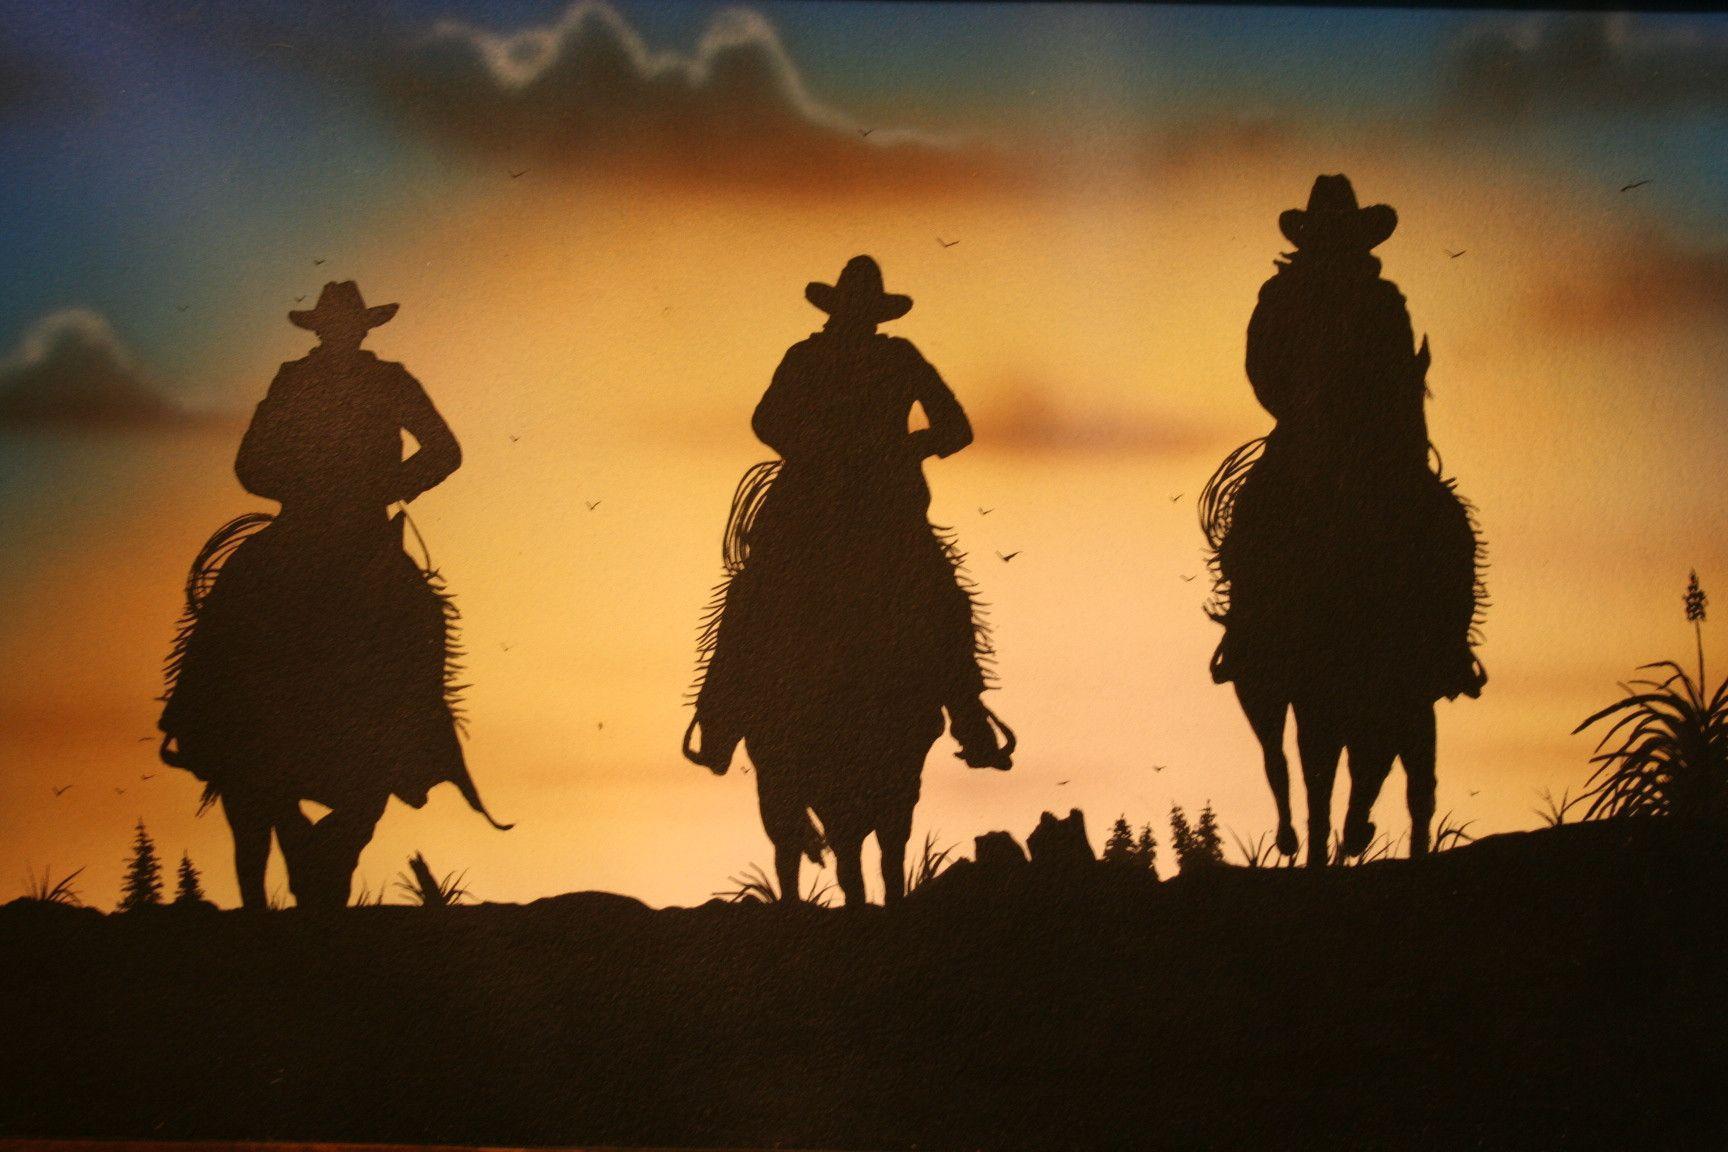 country Love Desktop Wallpaper : Western Desktop Wallpapers - Wallpaper cave